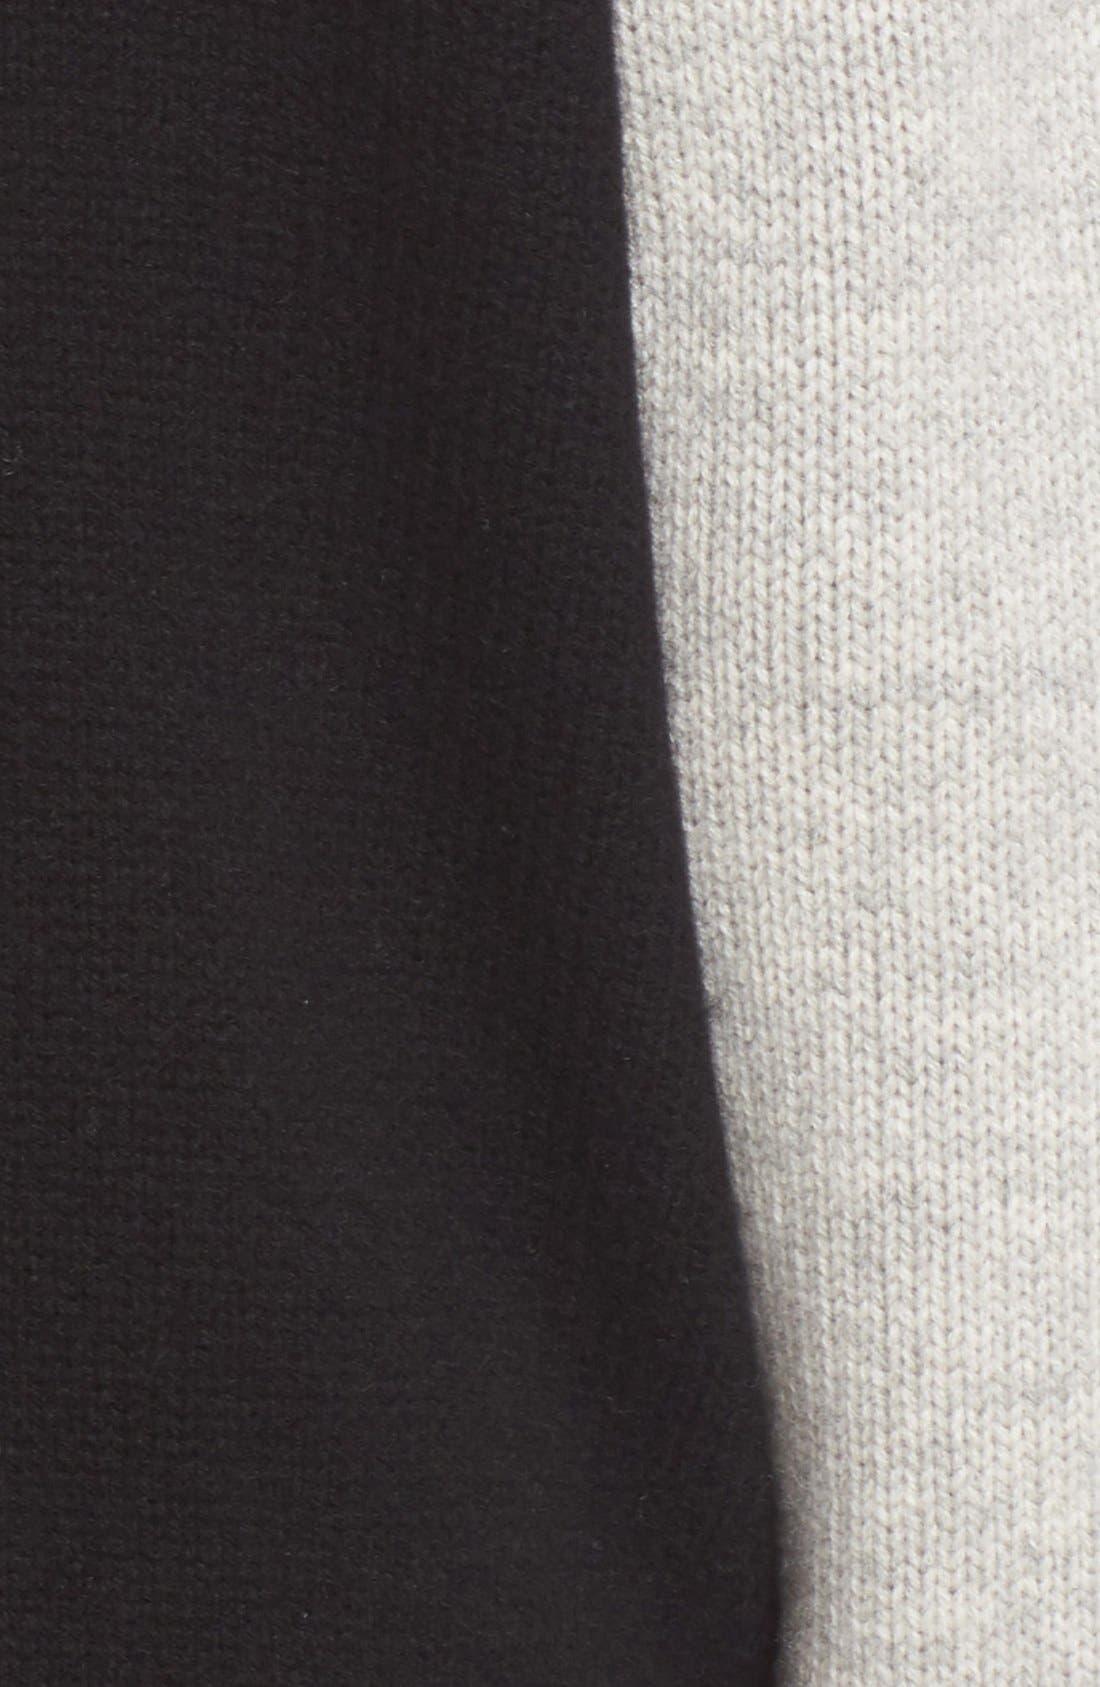 Stripe Detail Wool & Cashmere Knit Varsity Jacket,                             Alternate thumbnail 3, color,                             002